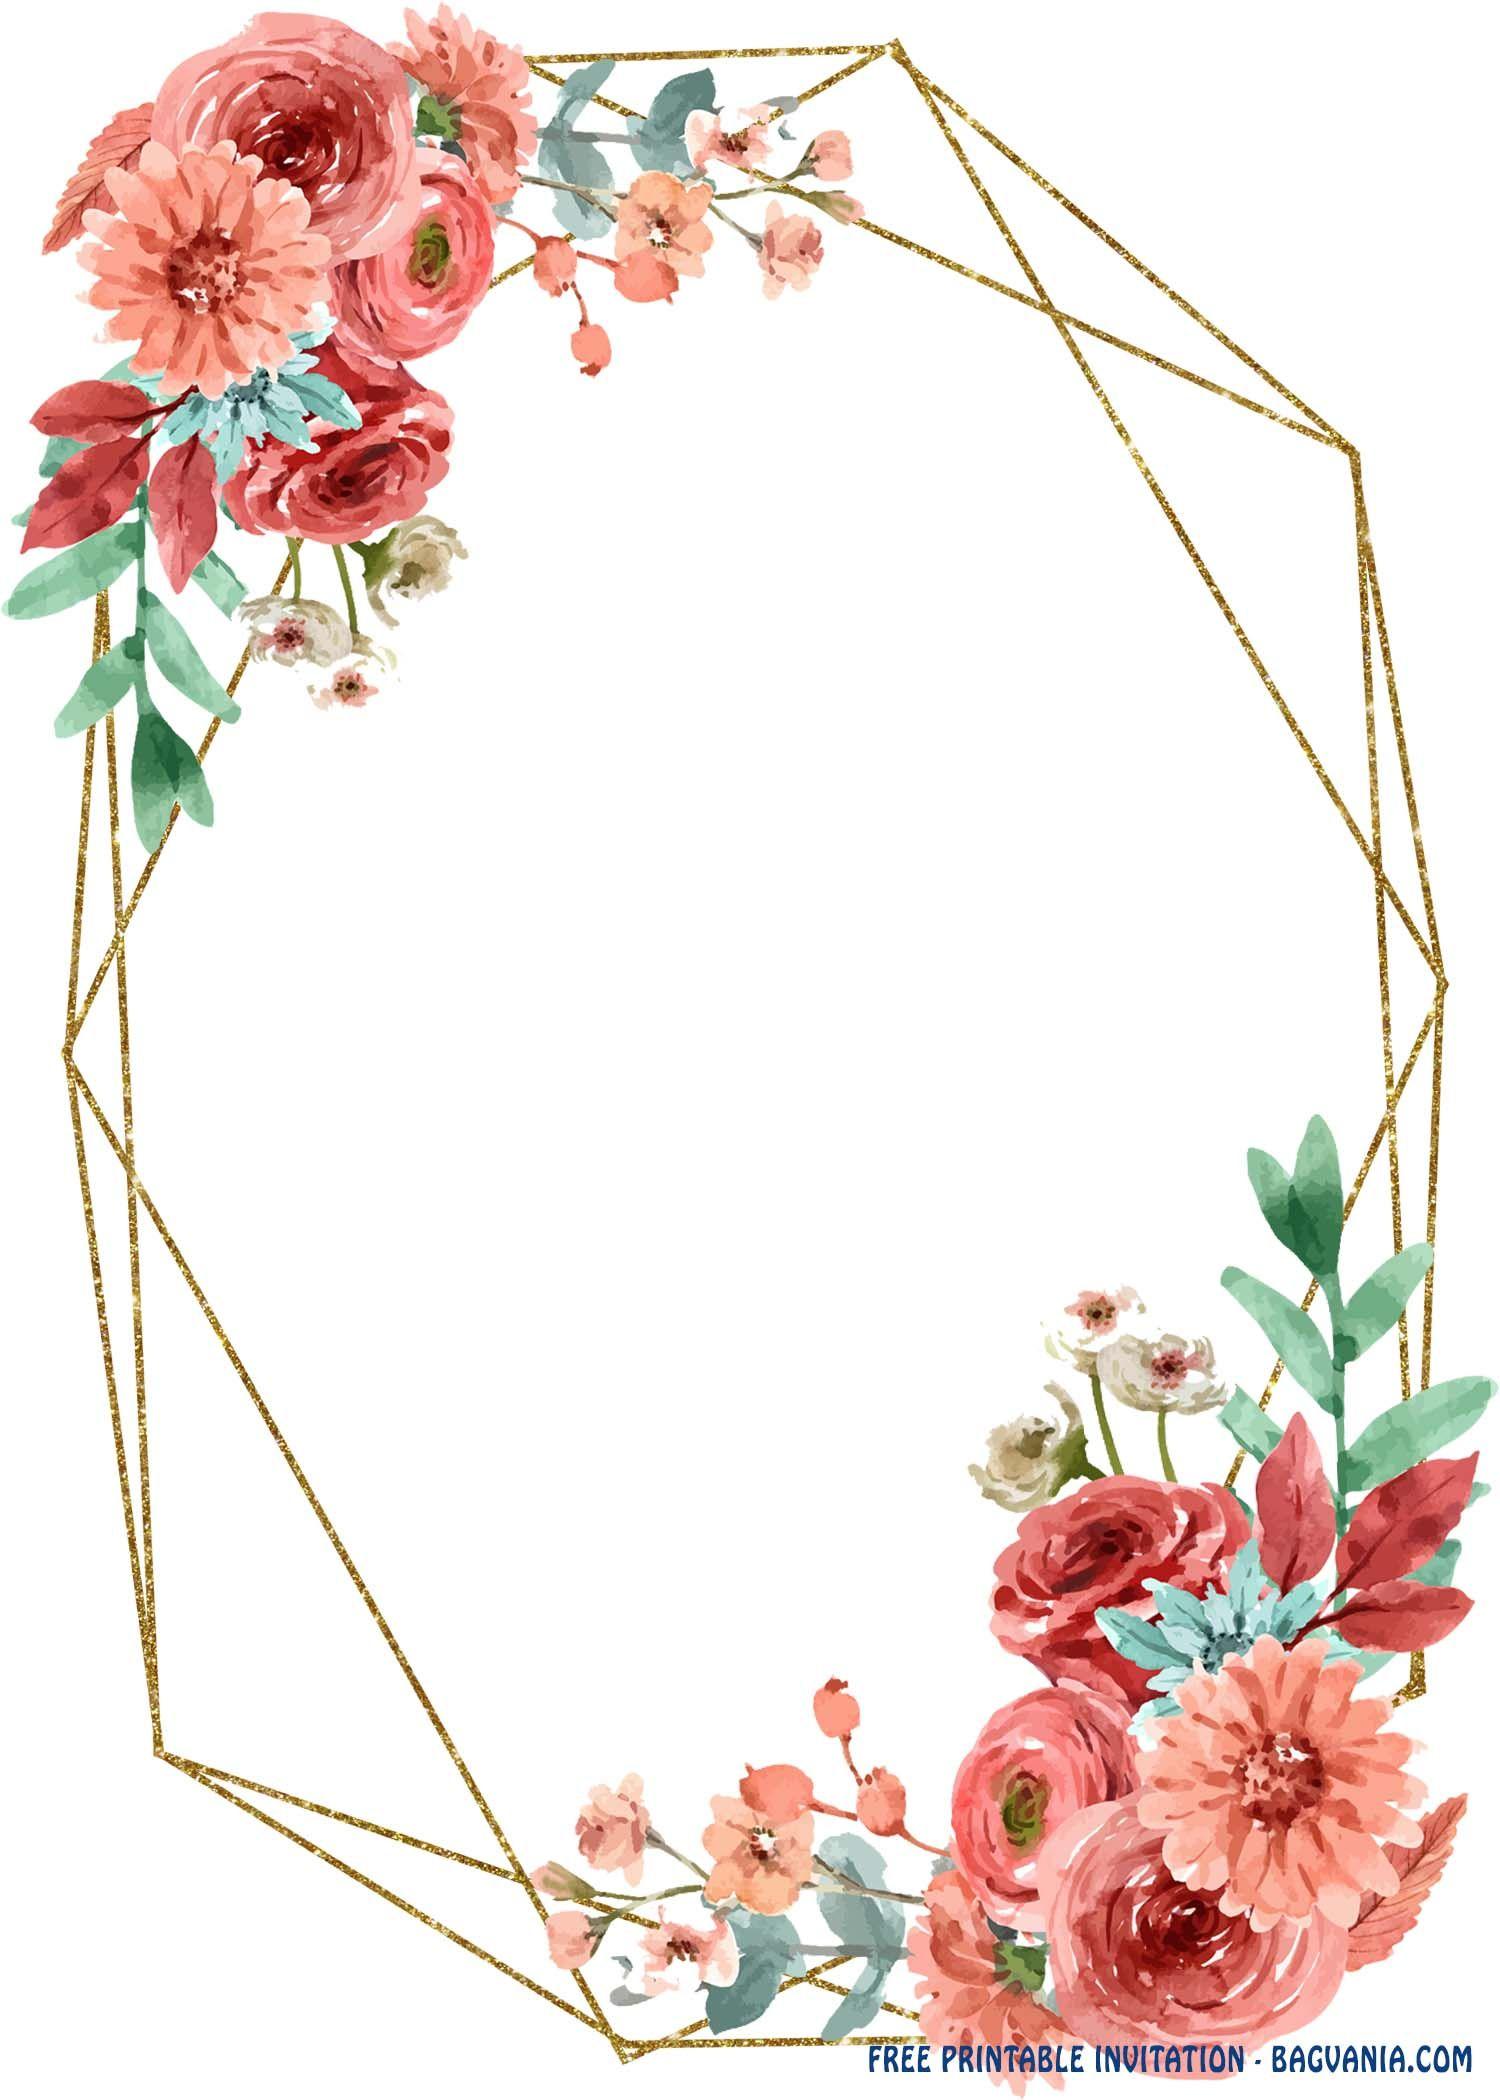 Free Printable Geometric Floral Invitation Templates Floral Invitations Template Templates Printable Free Floral Invitation